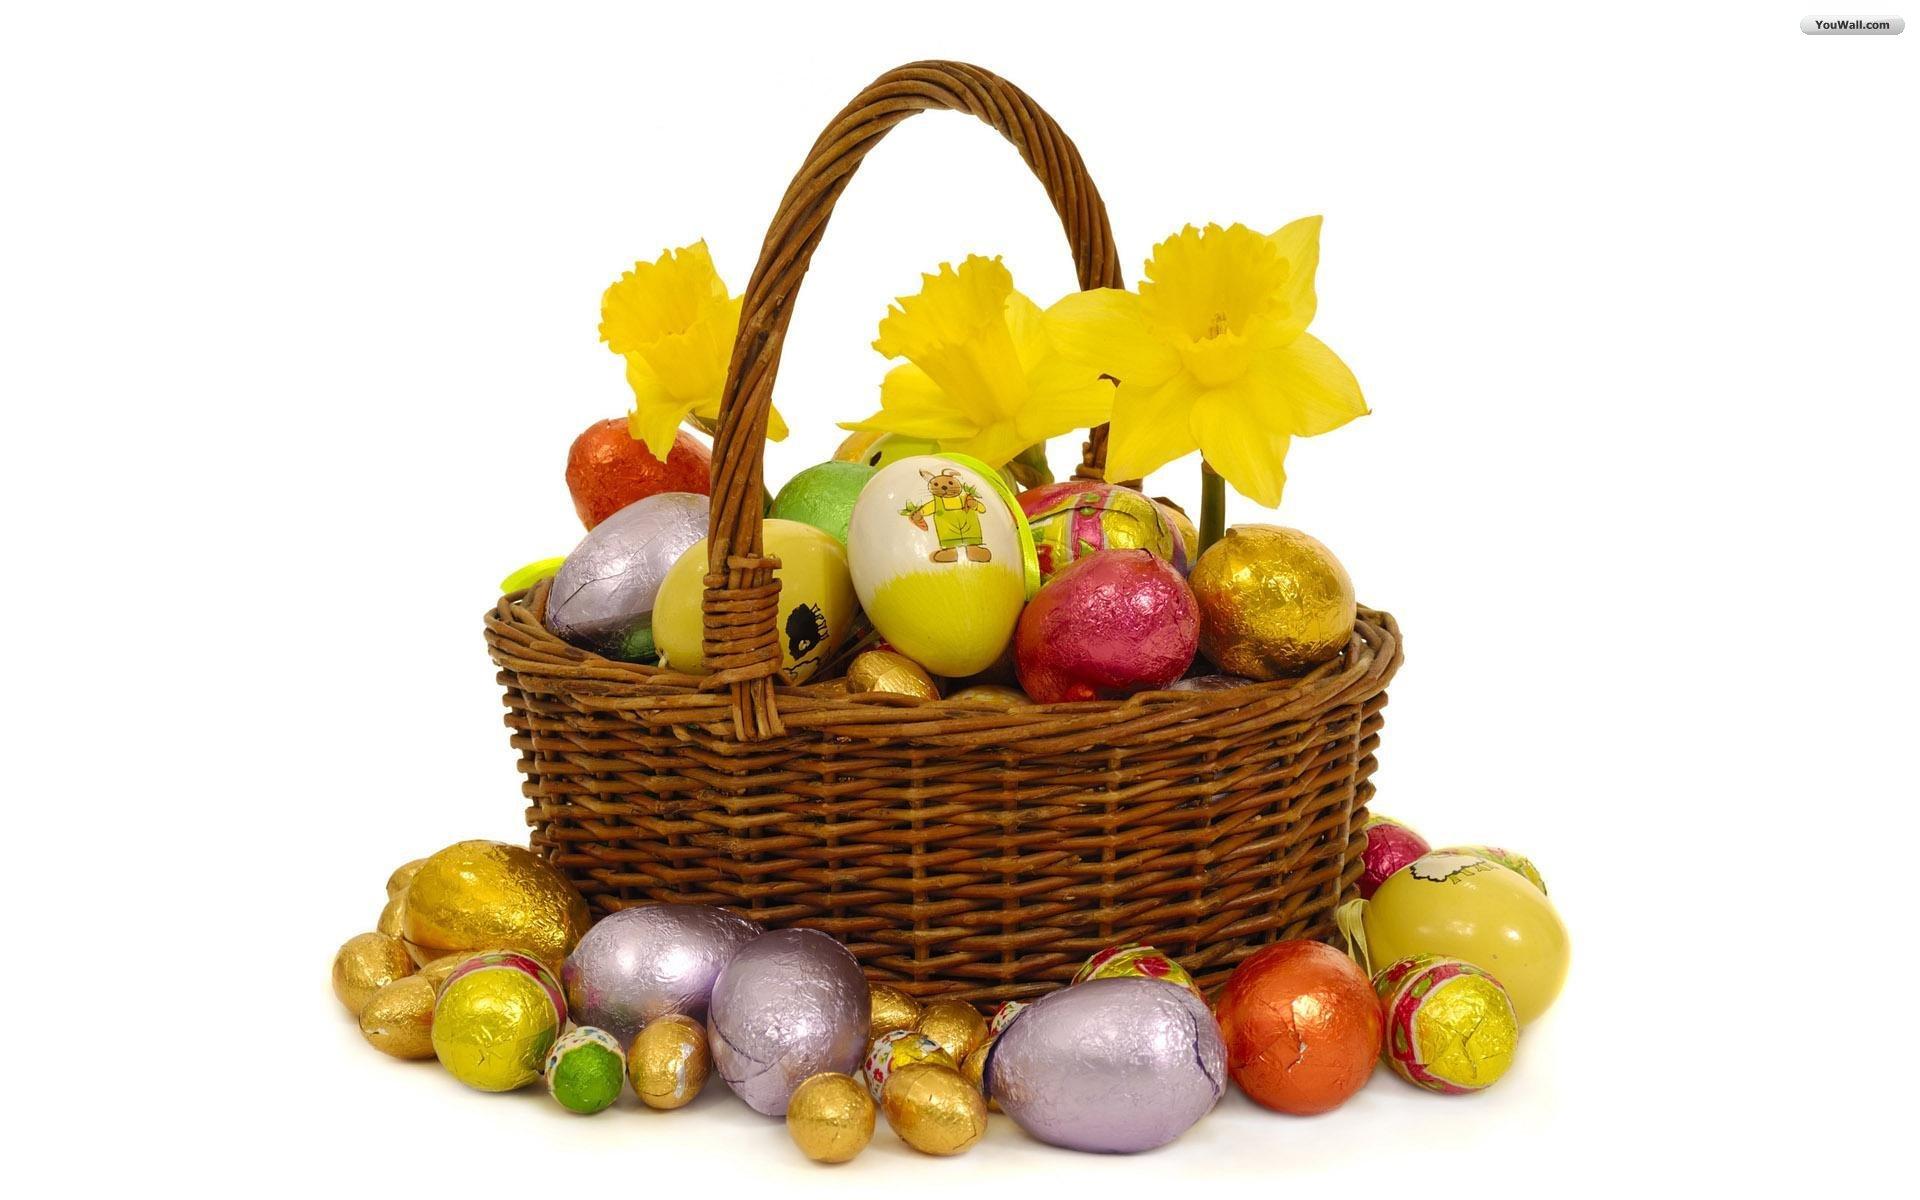 Free Easter Basket Wallpaper 40394 1920x1080 px